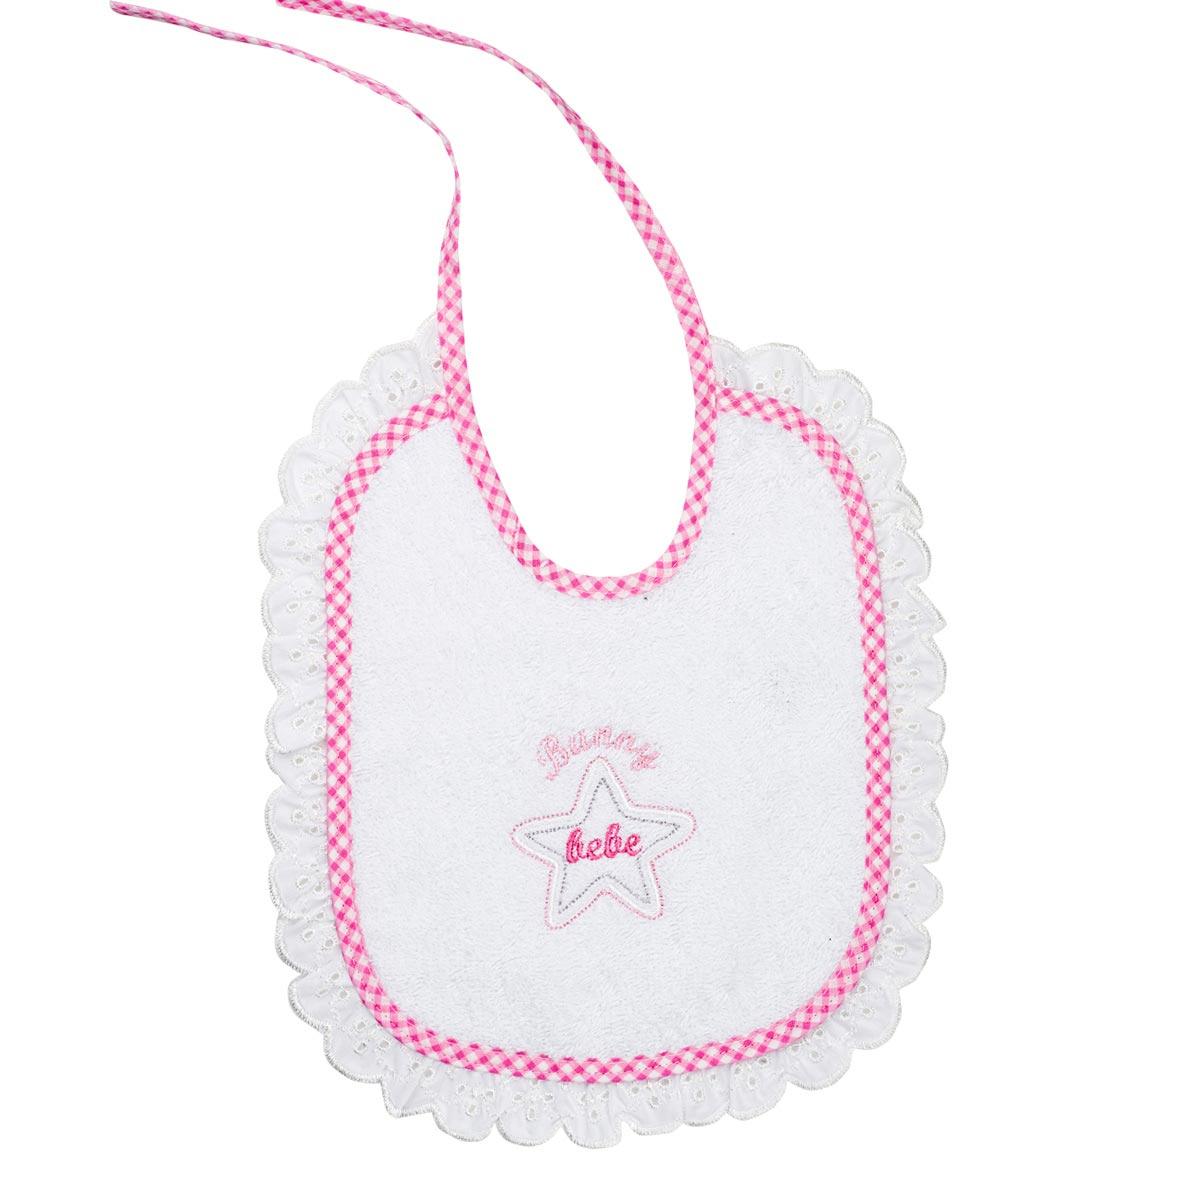 Bunny bebe σαλιάρα πετσετέ με ρέλι και δαντέλα αστεράκι ροζ